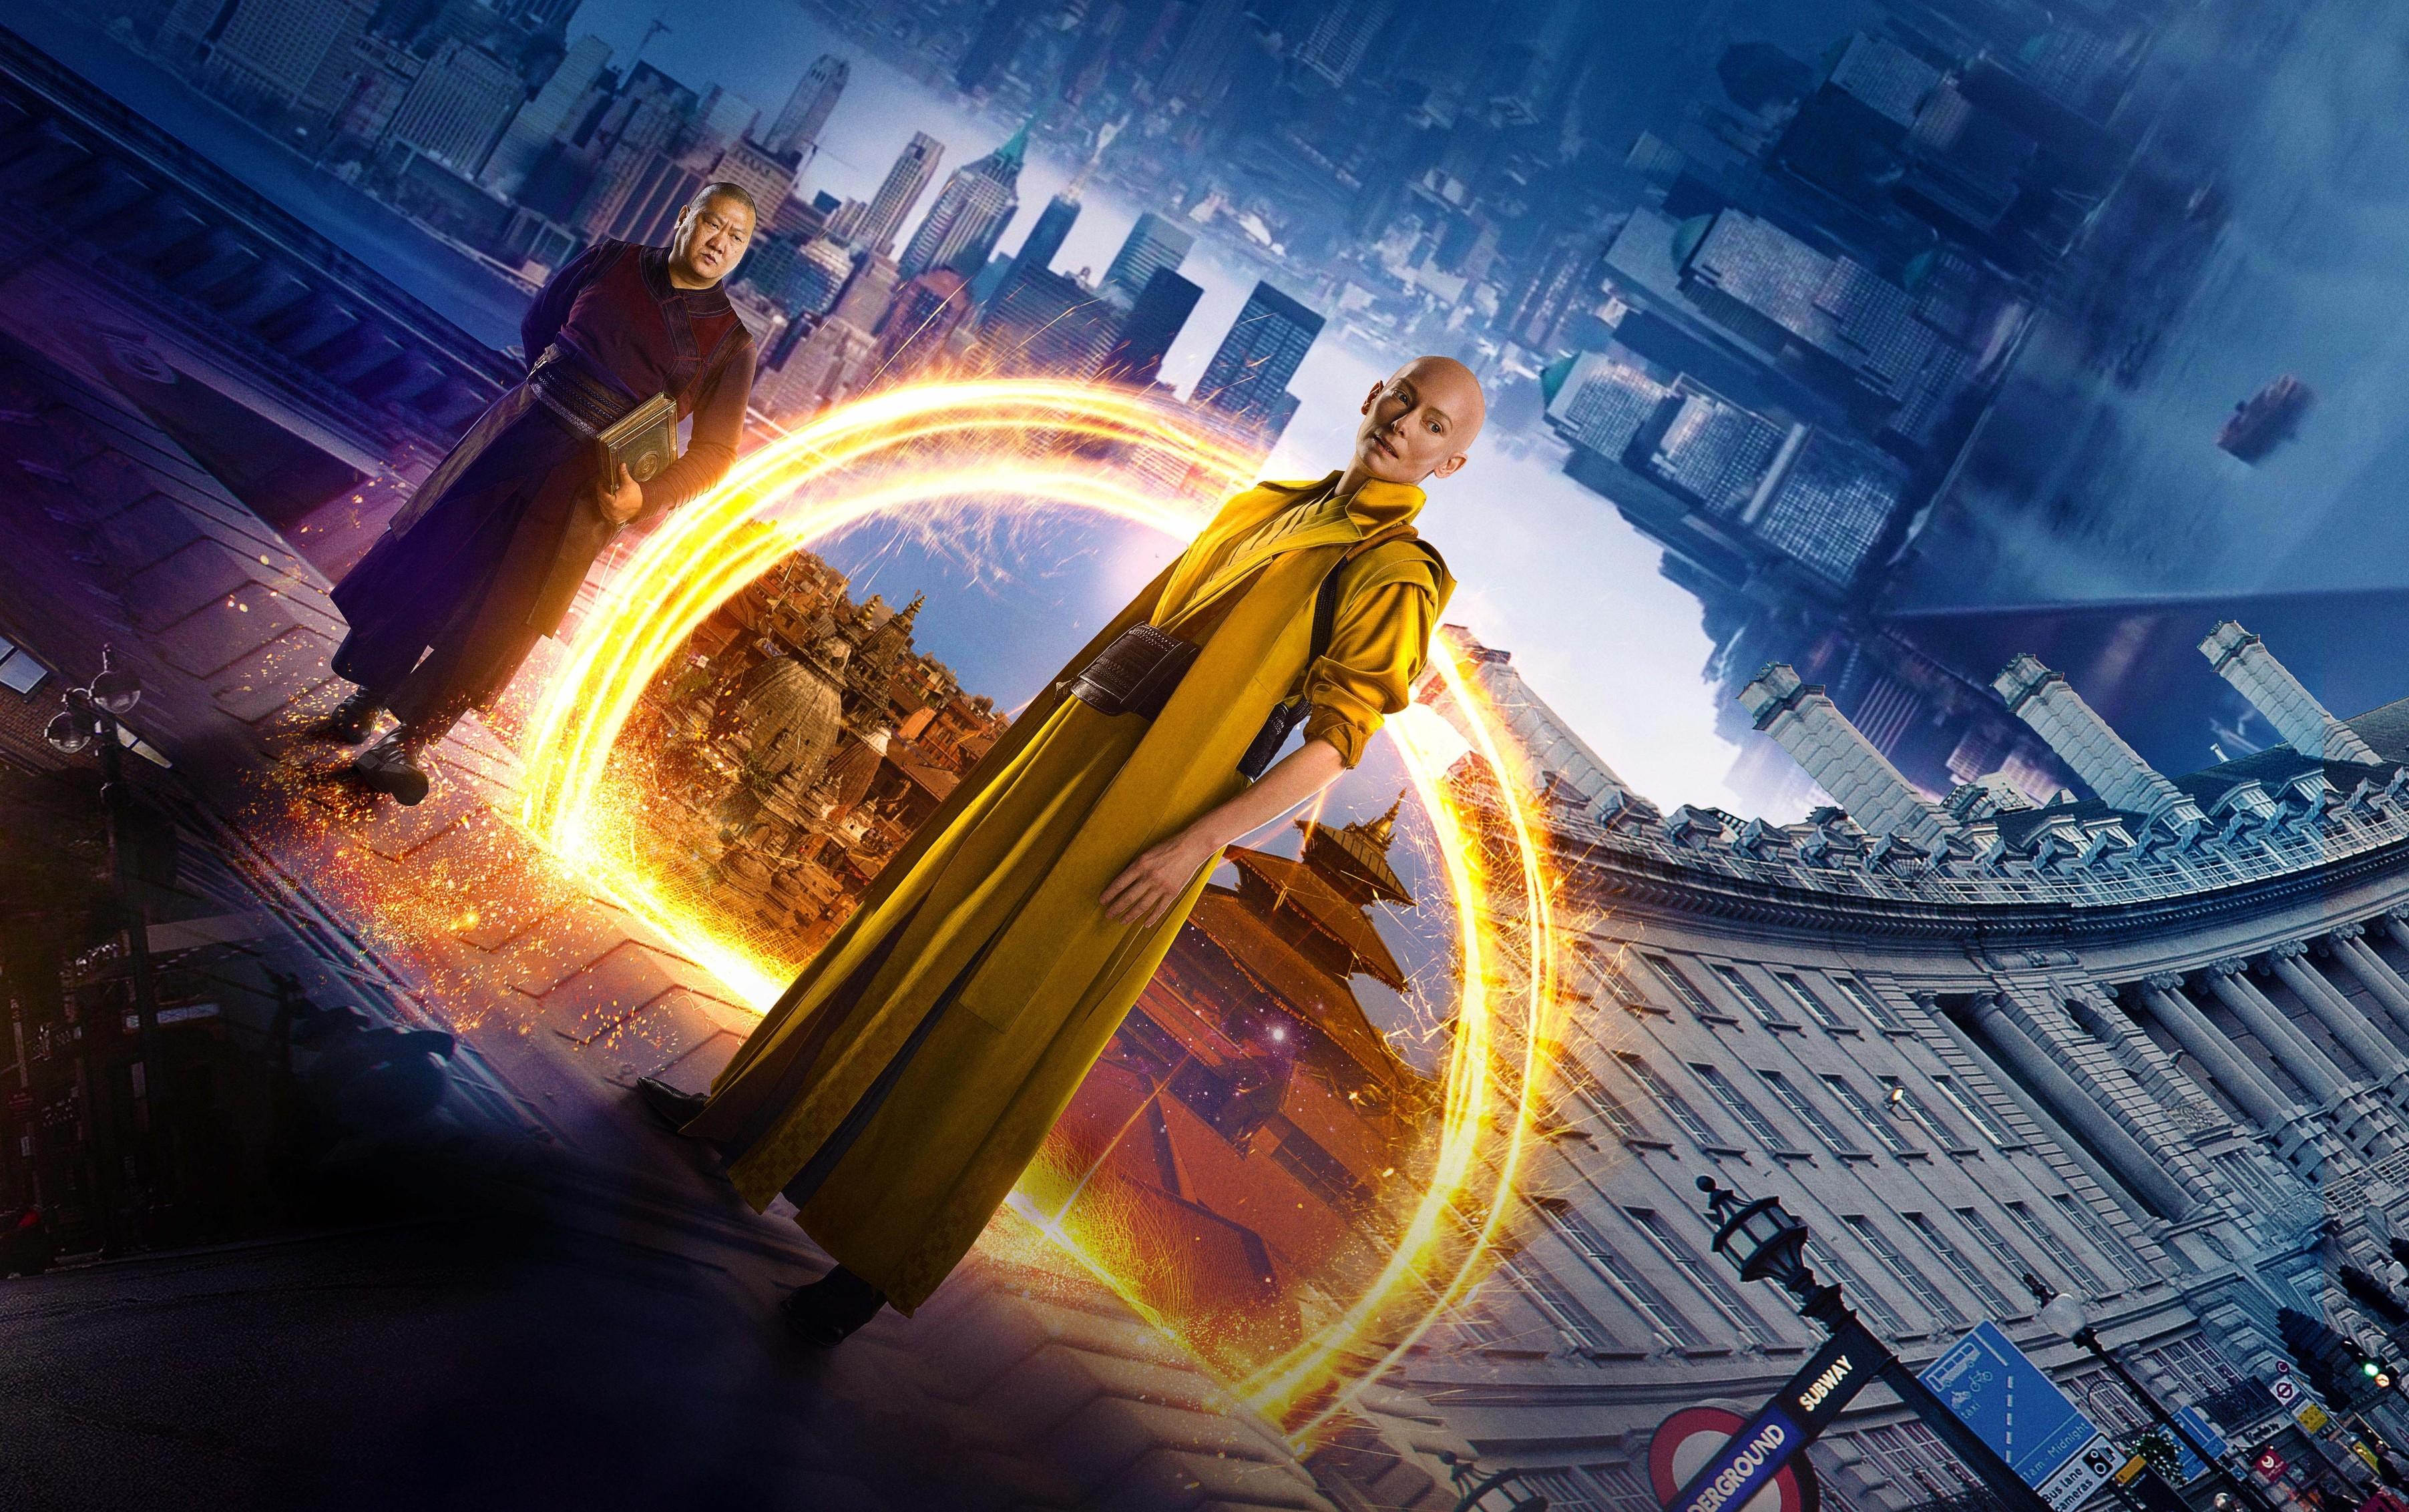 Doctor Strange Marvel Movie Wallpapers Widescreen Cinema: Wallpaper Doctor Strange, Tilda Swinton, Best Movies